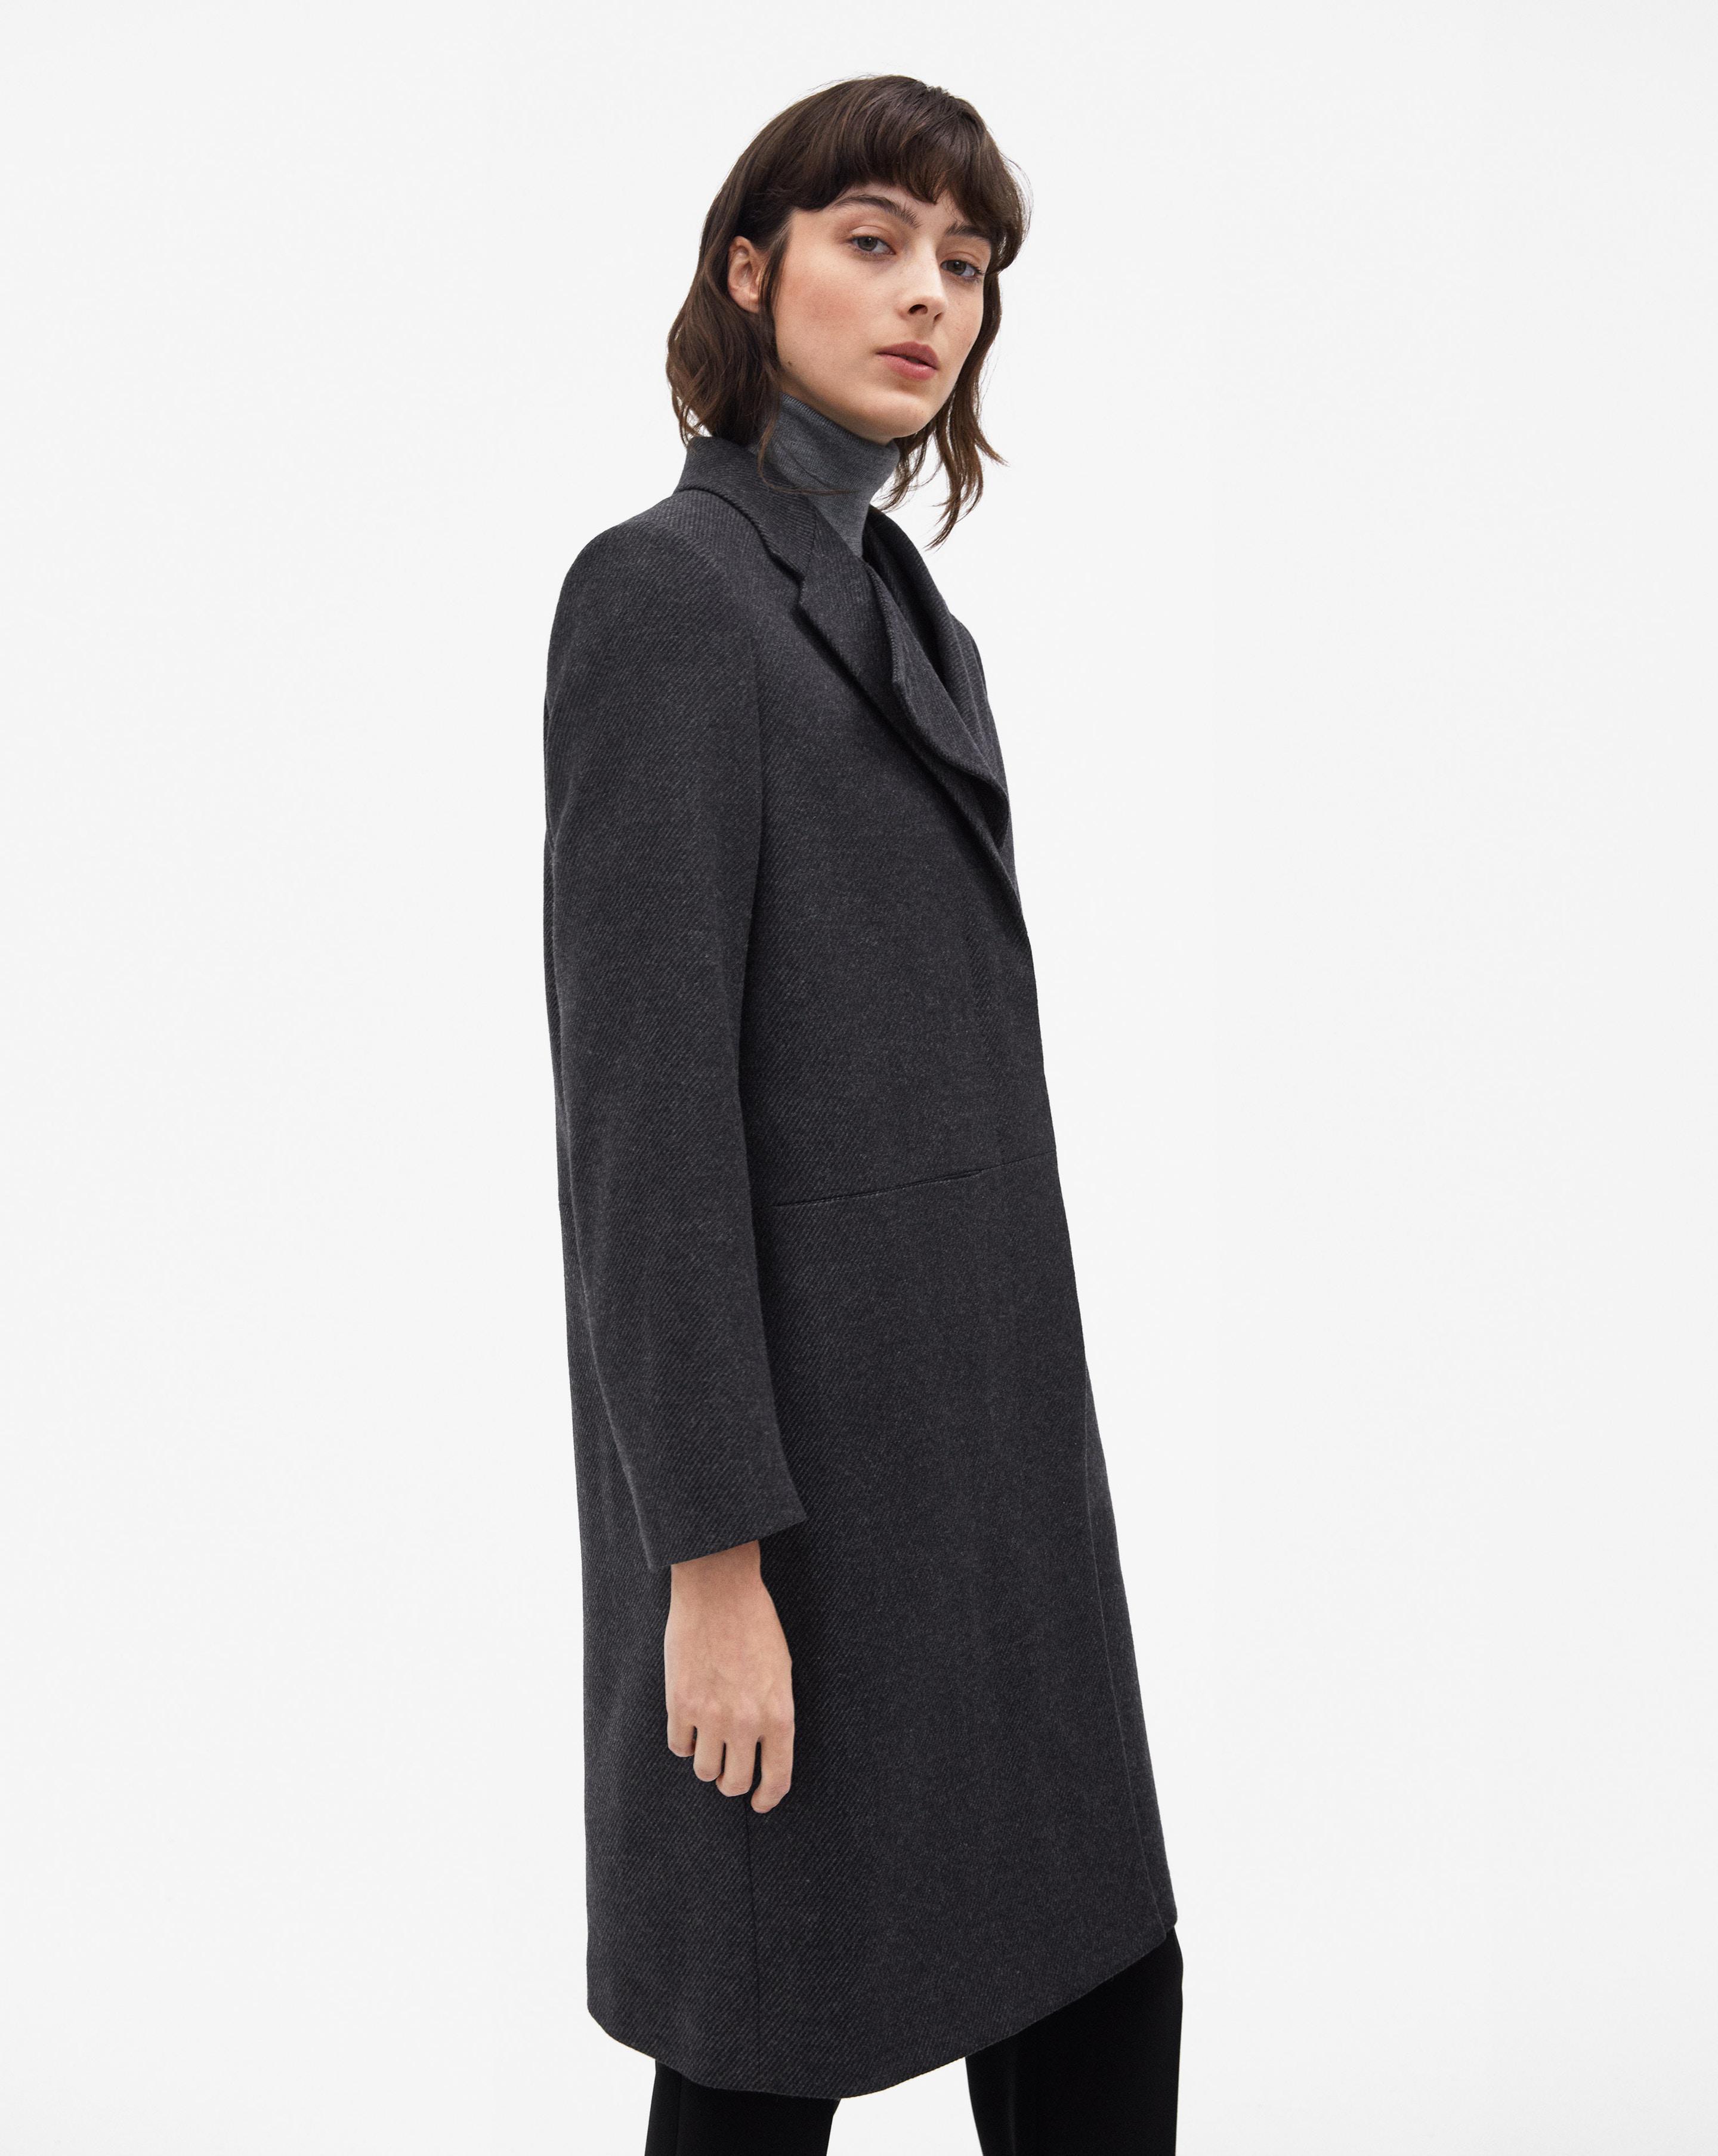 Lyst Runner Antracite Black Front Coat Filippa K In R86qzxZ0w